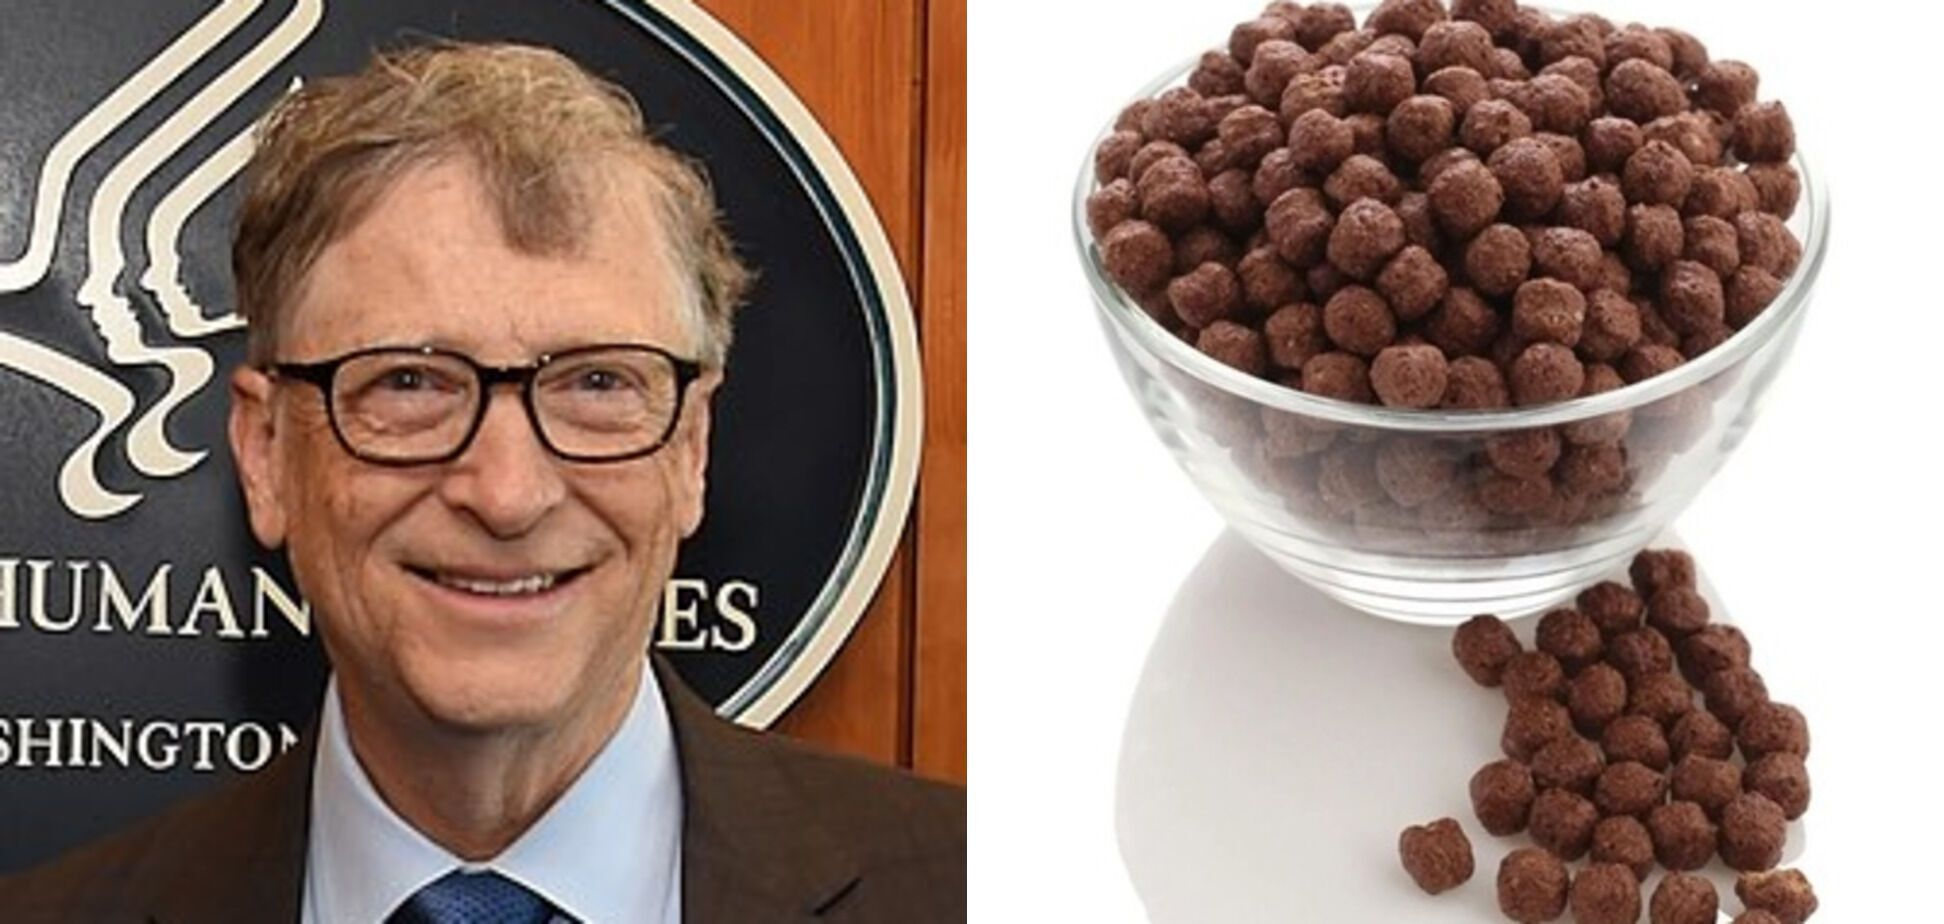 Завтрак Билла Гейтса